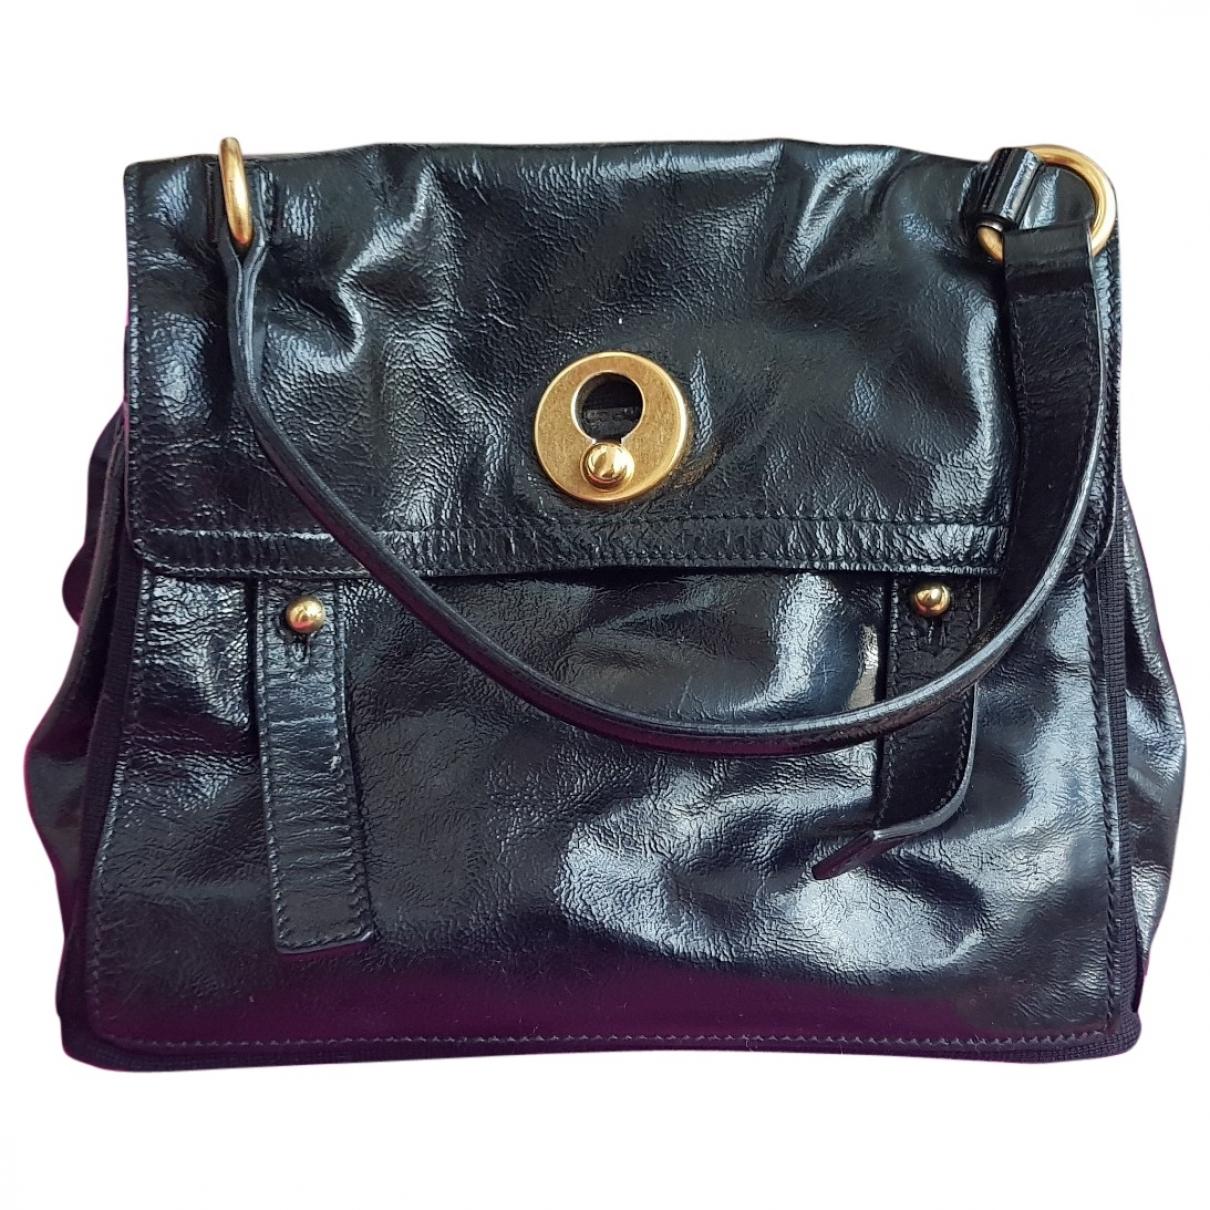 Saint Laurent Muse II Black Patent leather handbag for Women \N